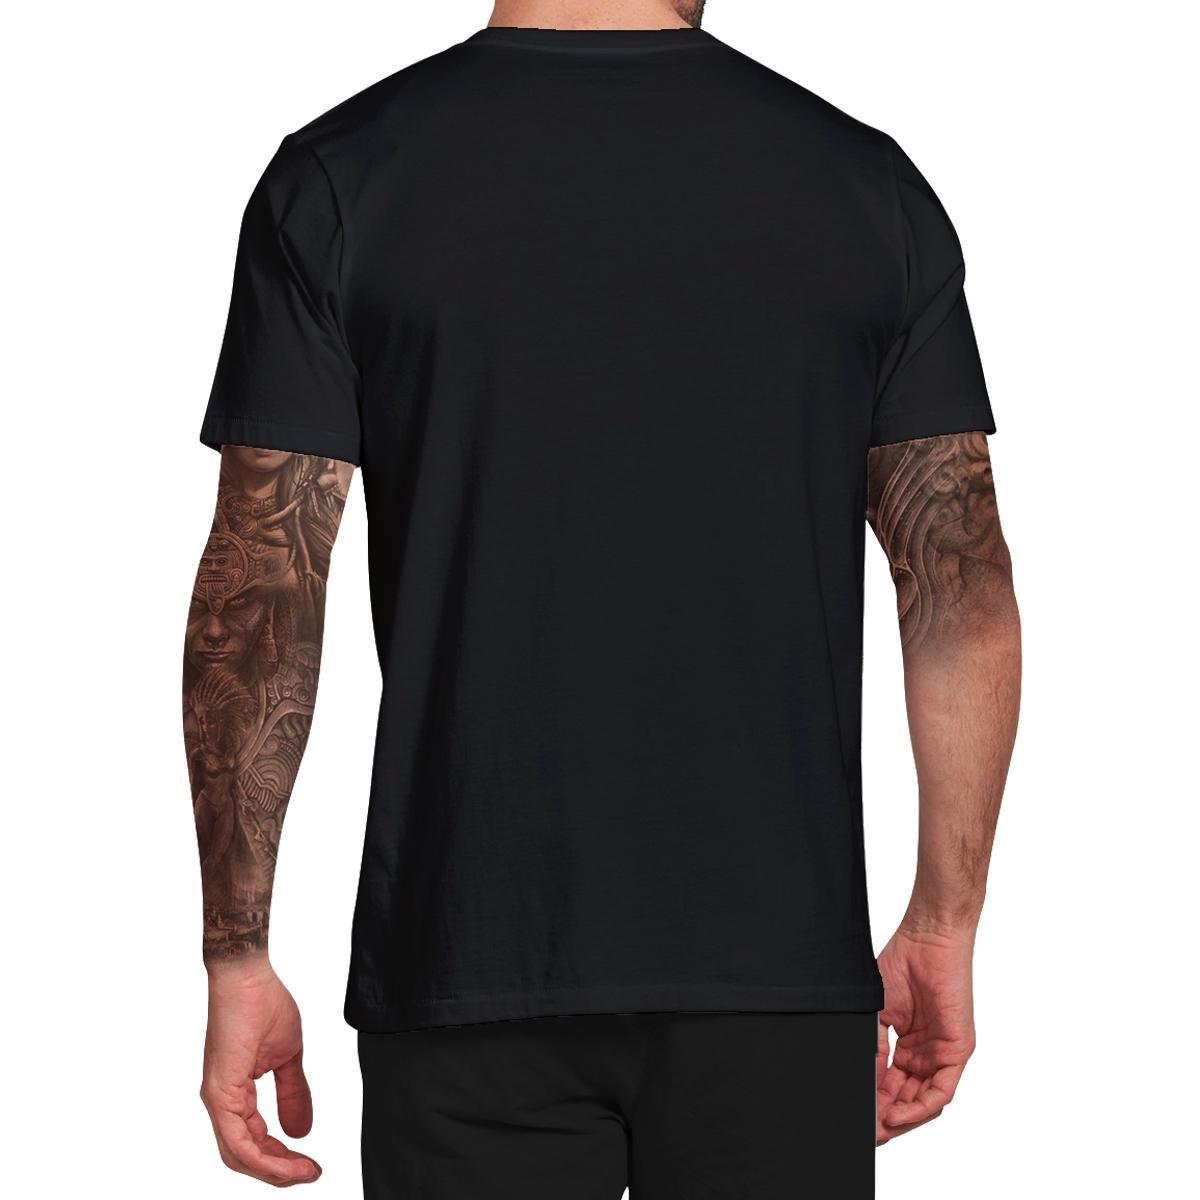 Camiseta Stompy Tattoo Collection Masculina - Preto